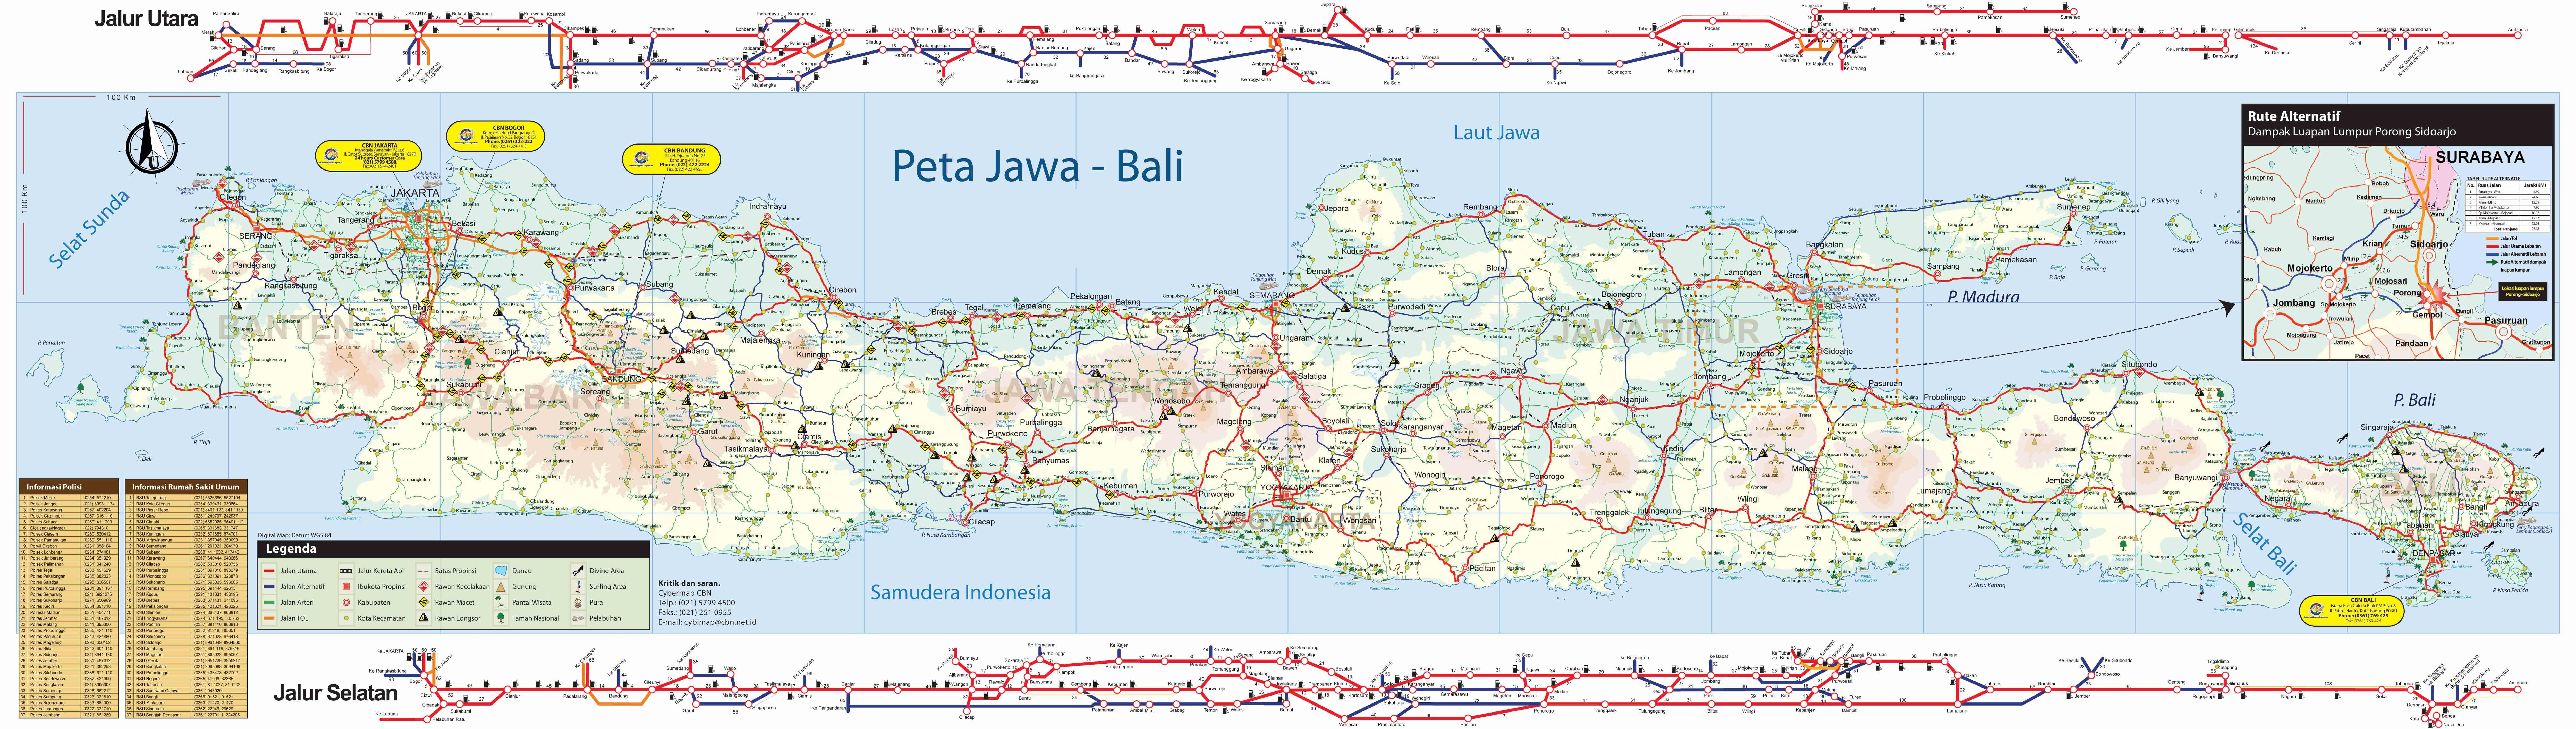 Peta Mudik 2010 Jawa Bali & 10 Kartu Lebaran Pilihan